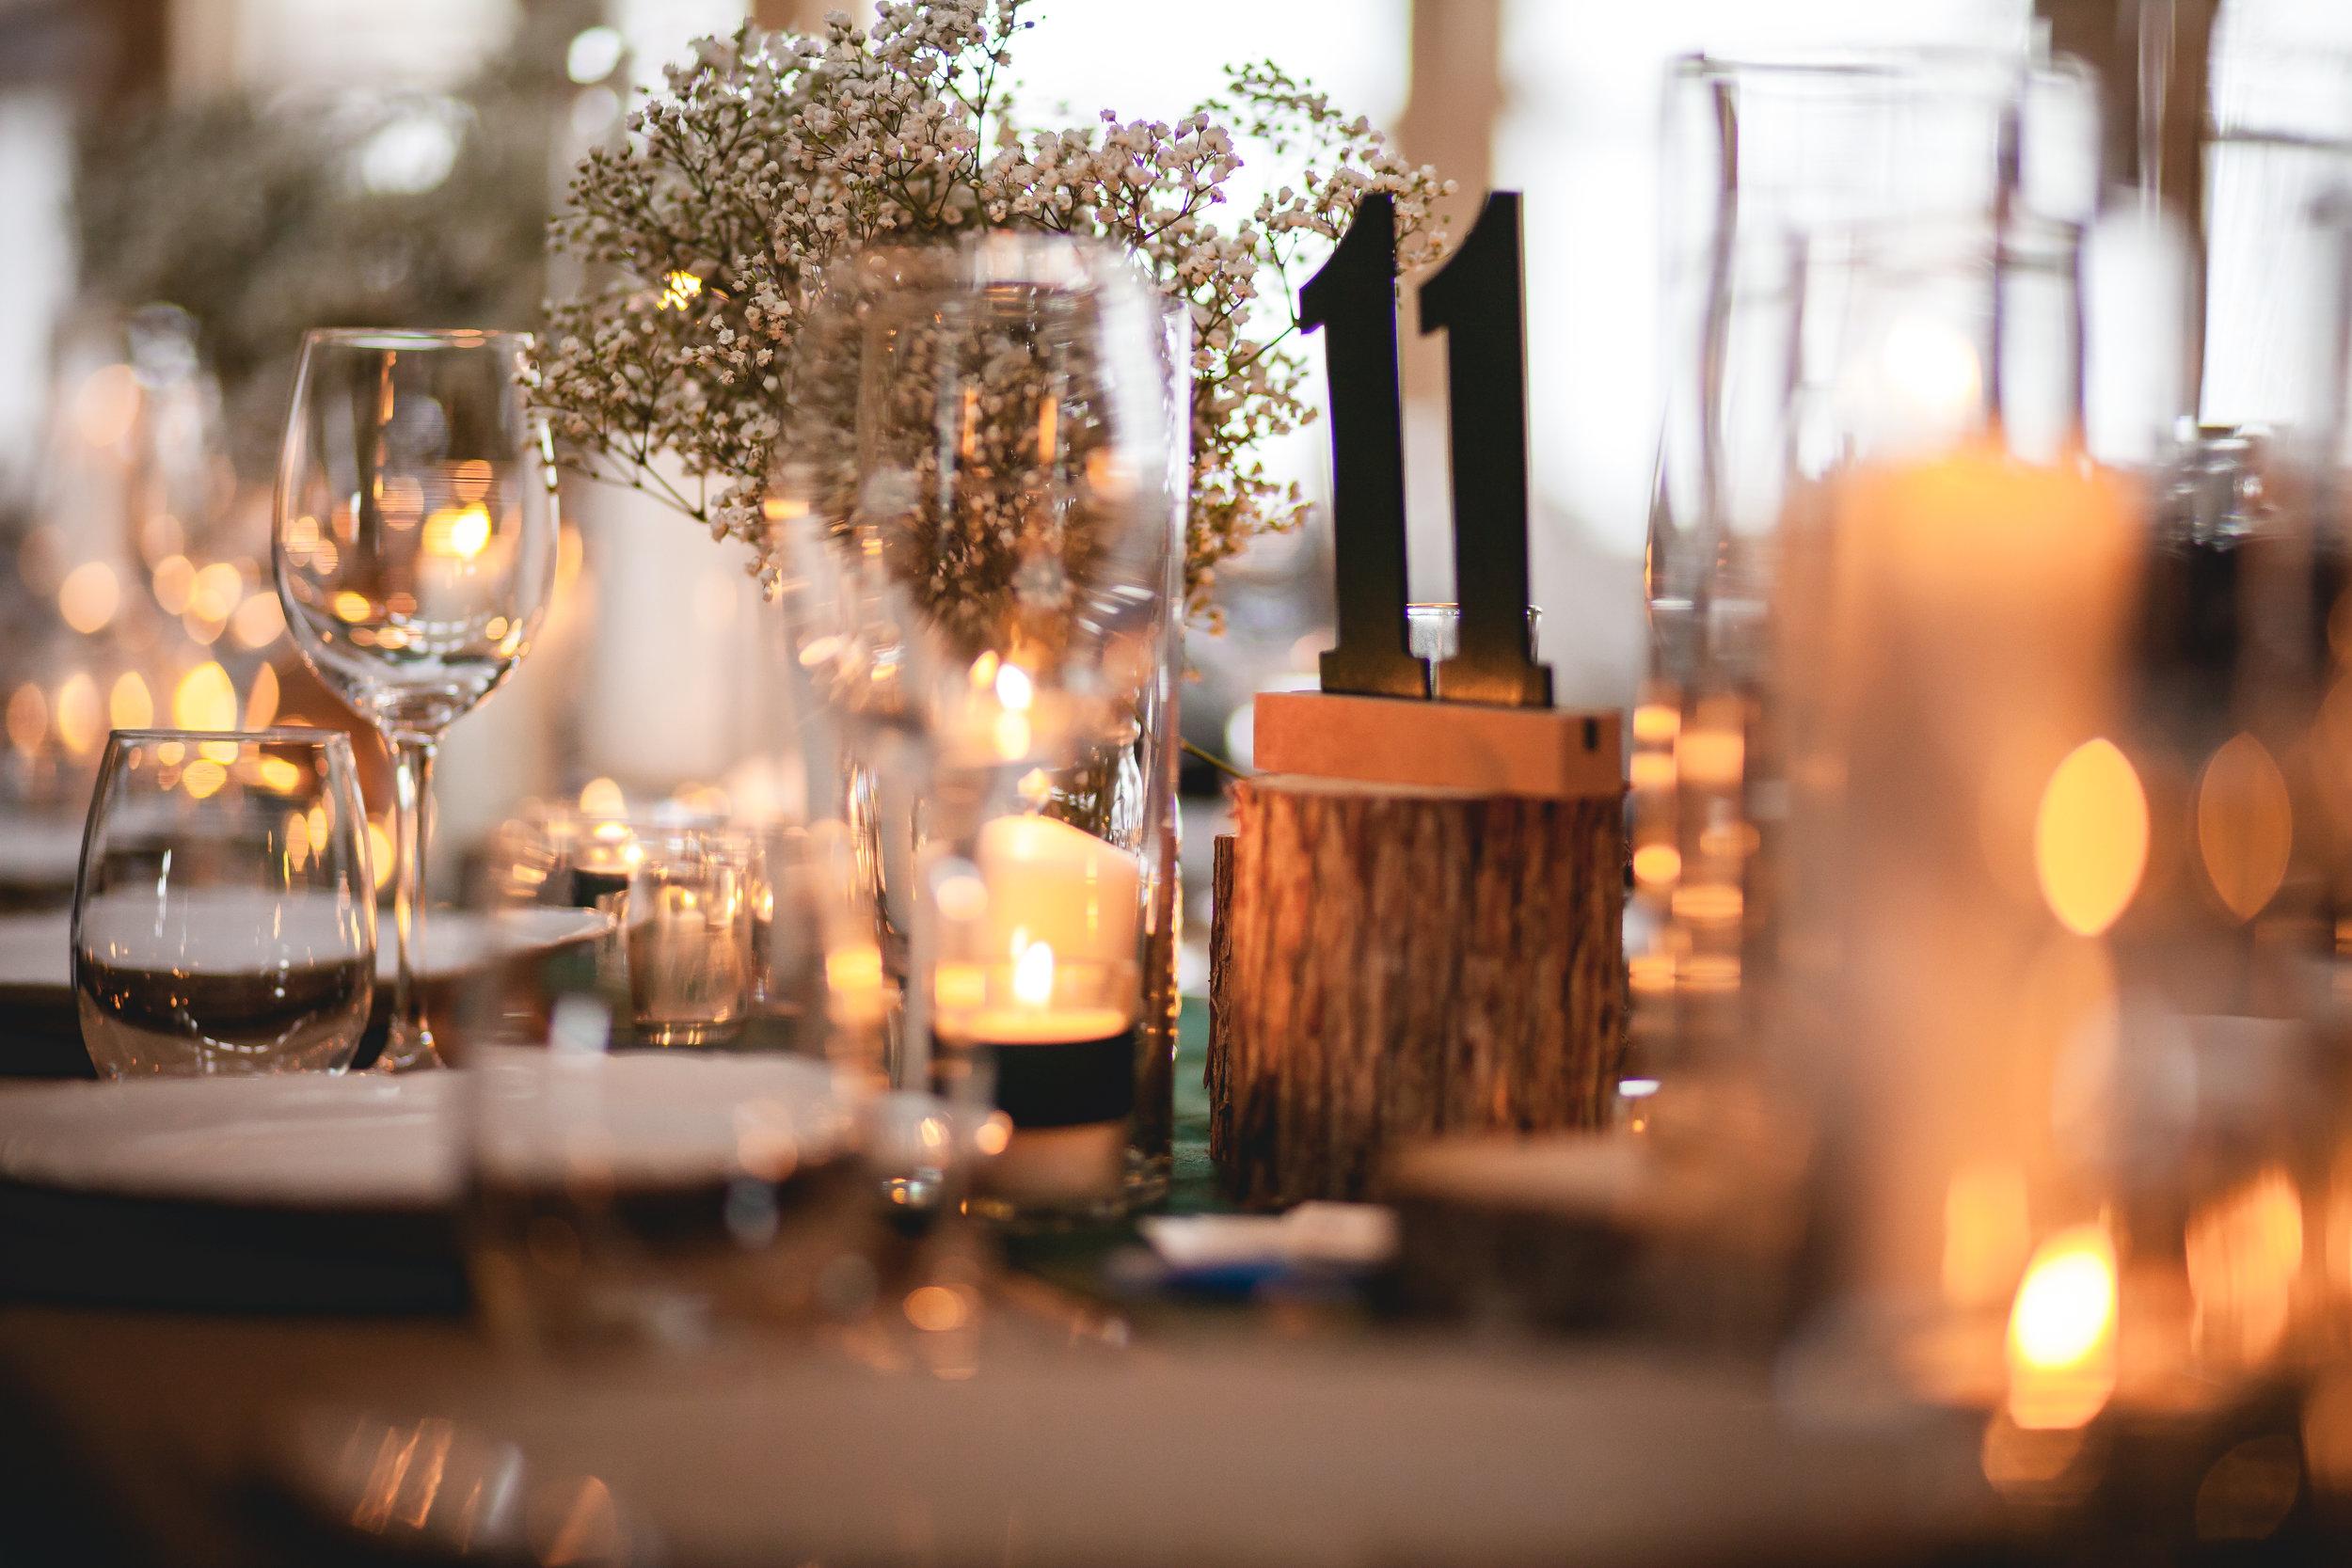 Amy D Photography- Winter Wedding- Tiffin Centre- Vintage Wedding Decor- Rustic Wedding- Wedding Decorations- Barrie Wedding Photography- Wedding Decor Ideas- Barrie Weddings (93 of 129).jpg